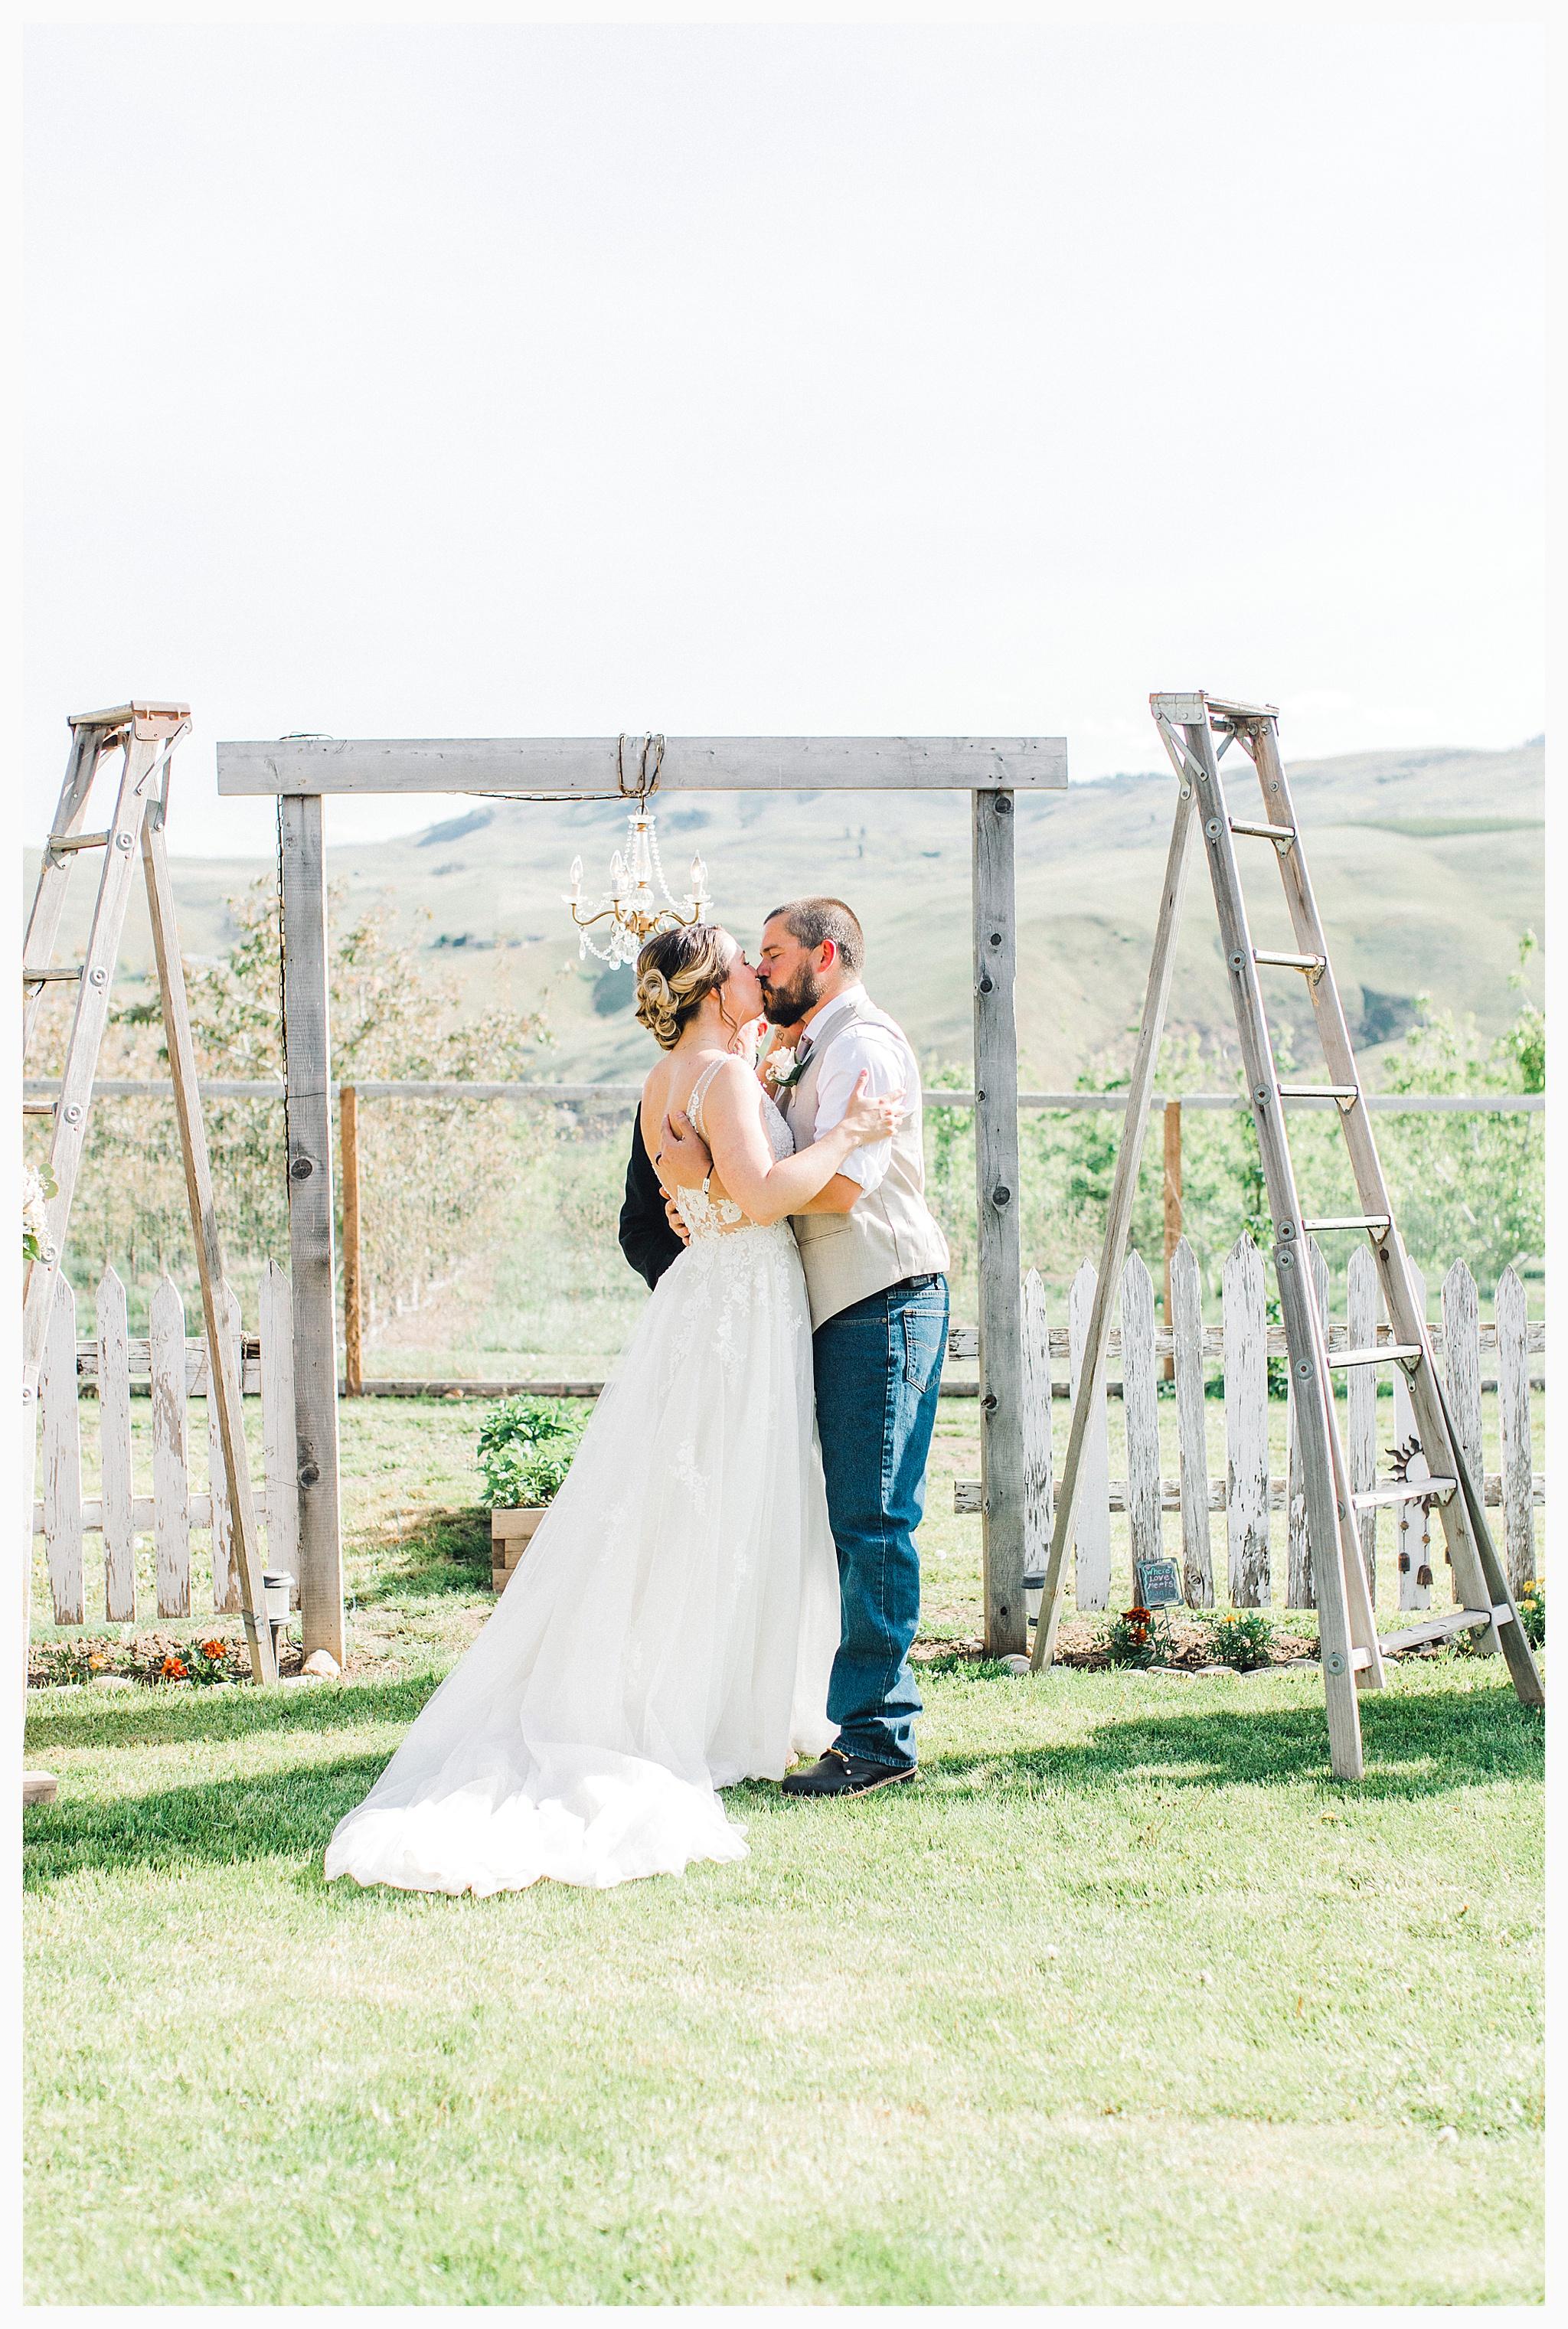 Rustic barn wedding in Wenatchee Washington at Sunshine Ranch on Easy Street, Emma Rose Company Seattle PNW Light and Airy Wedding Photographer_0063.jpg